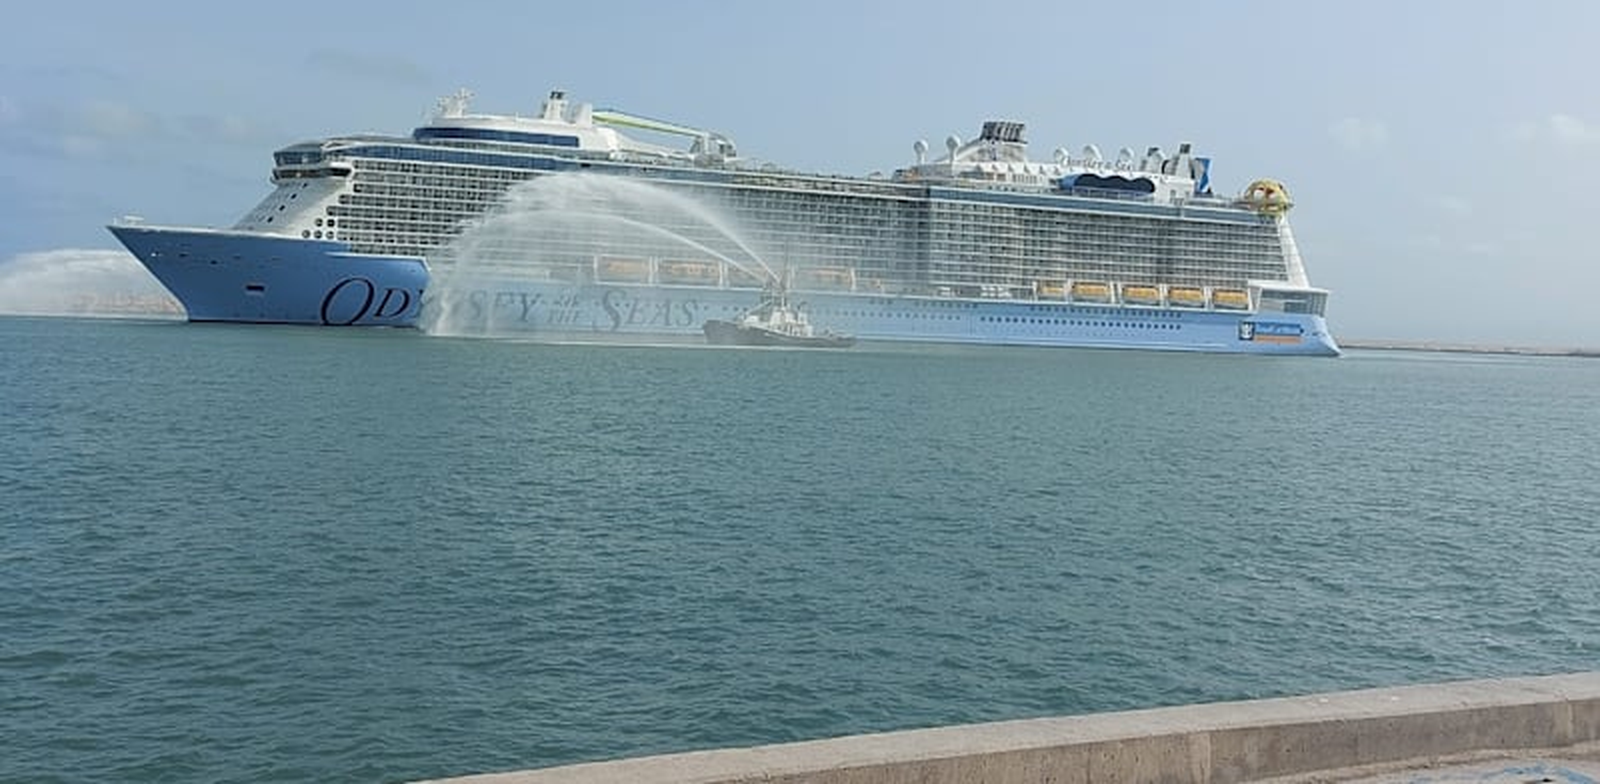 Odyssey of the Seas enters Haifa Photo: Haifa Port